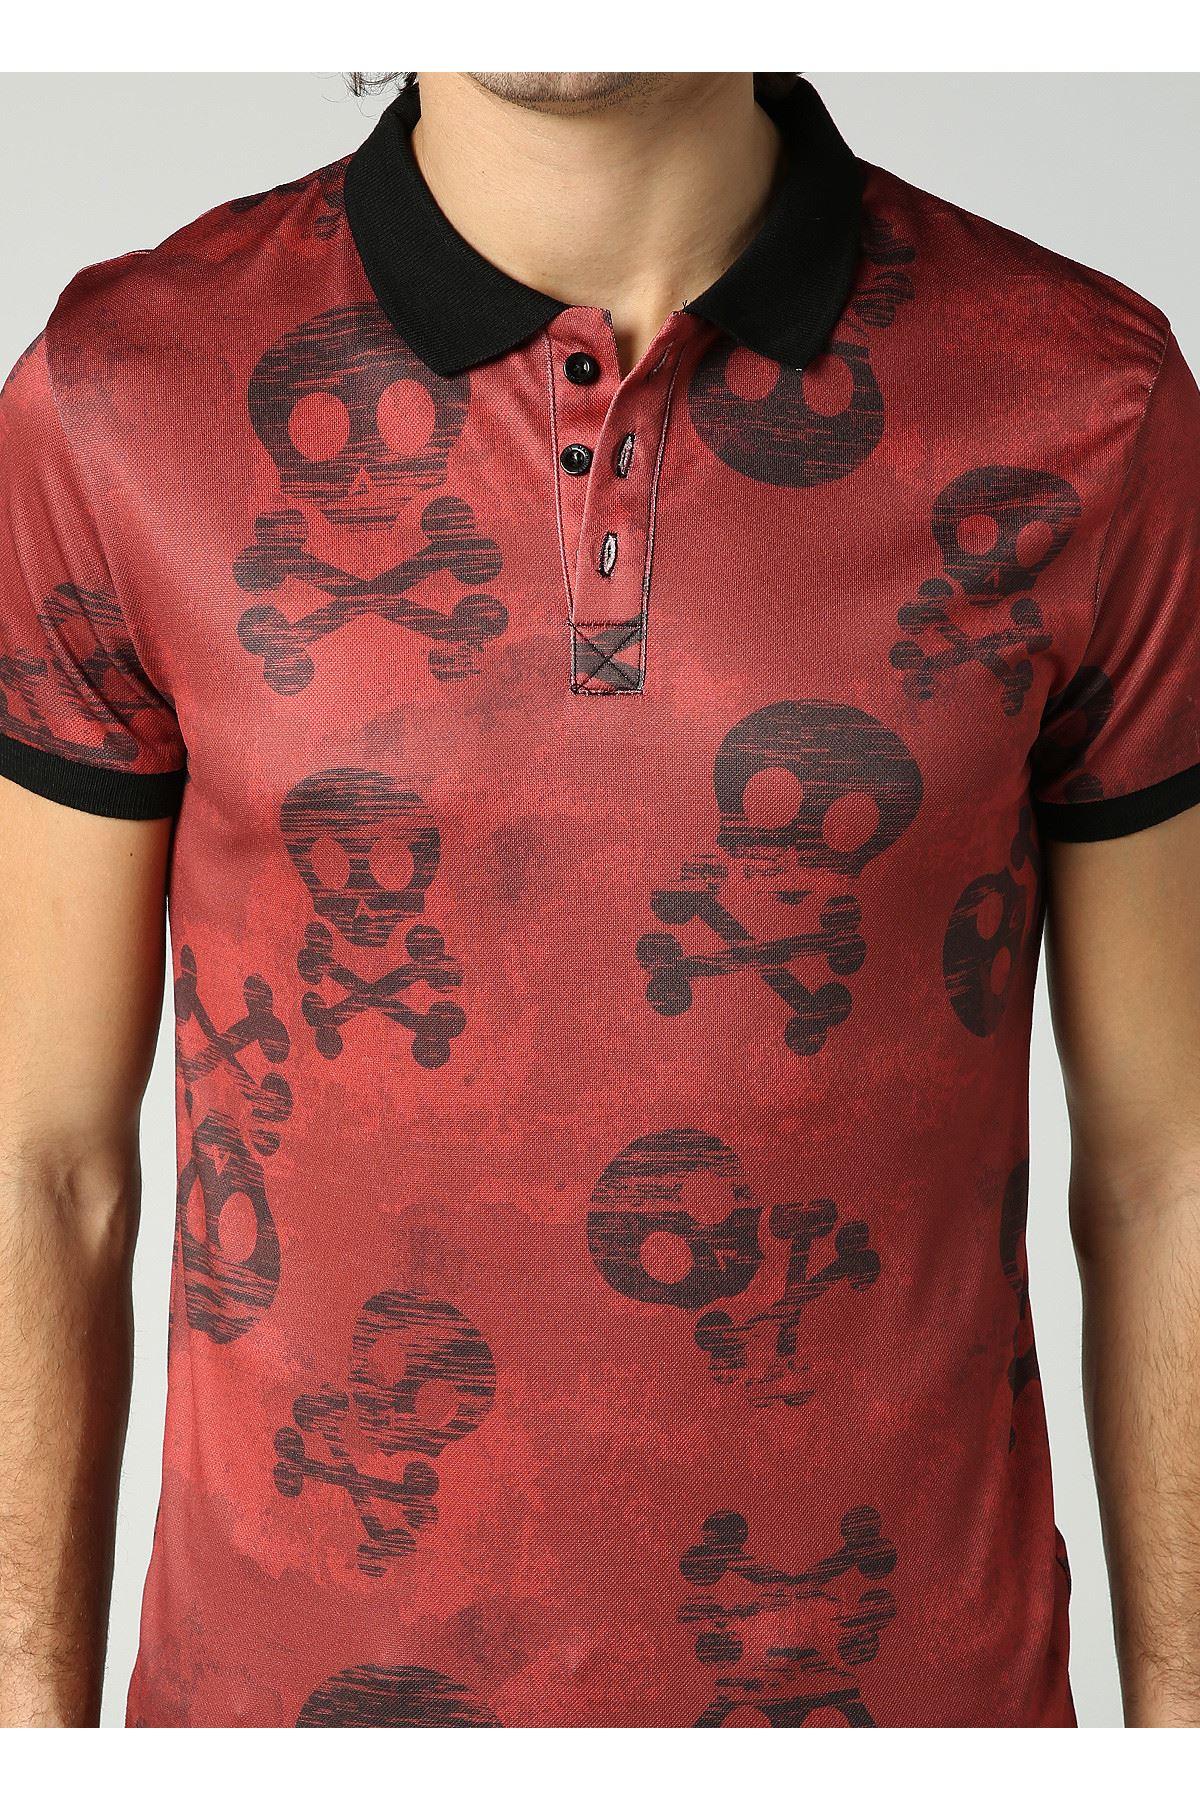 Kuru Kafa Desen Polo Yaka Bordo Erkek T-Shirt